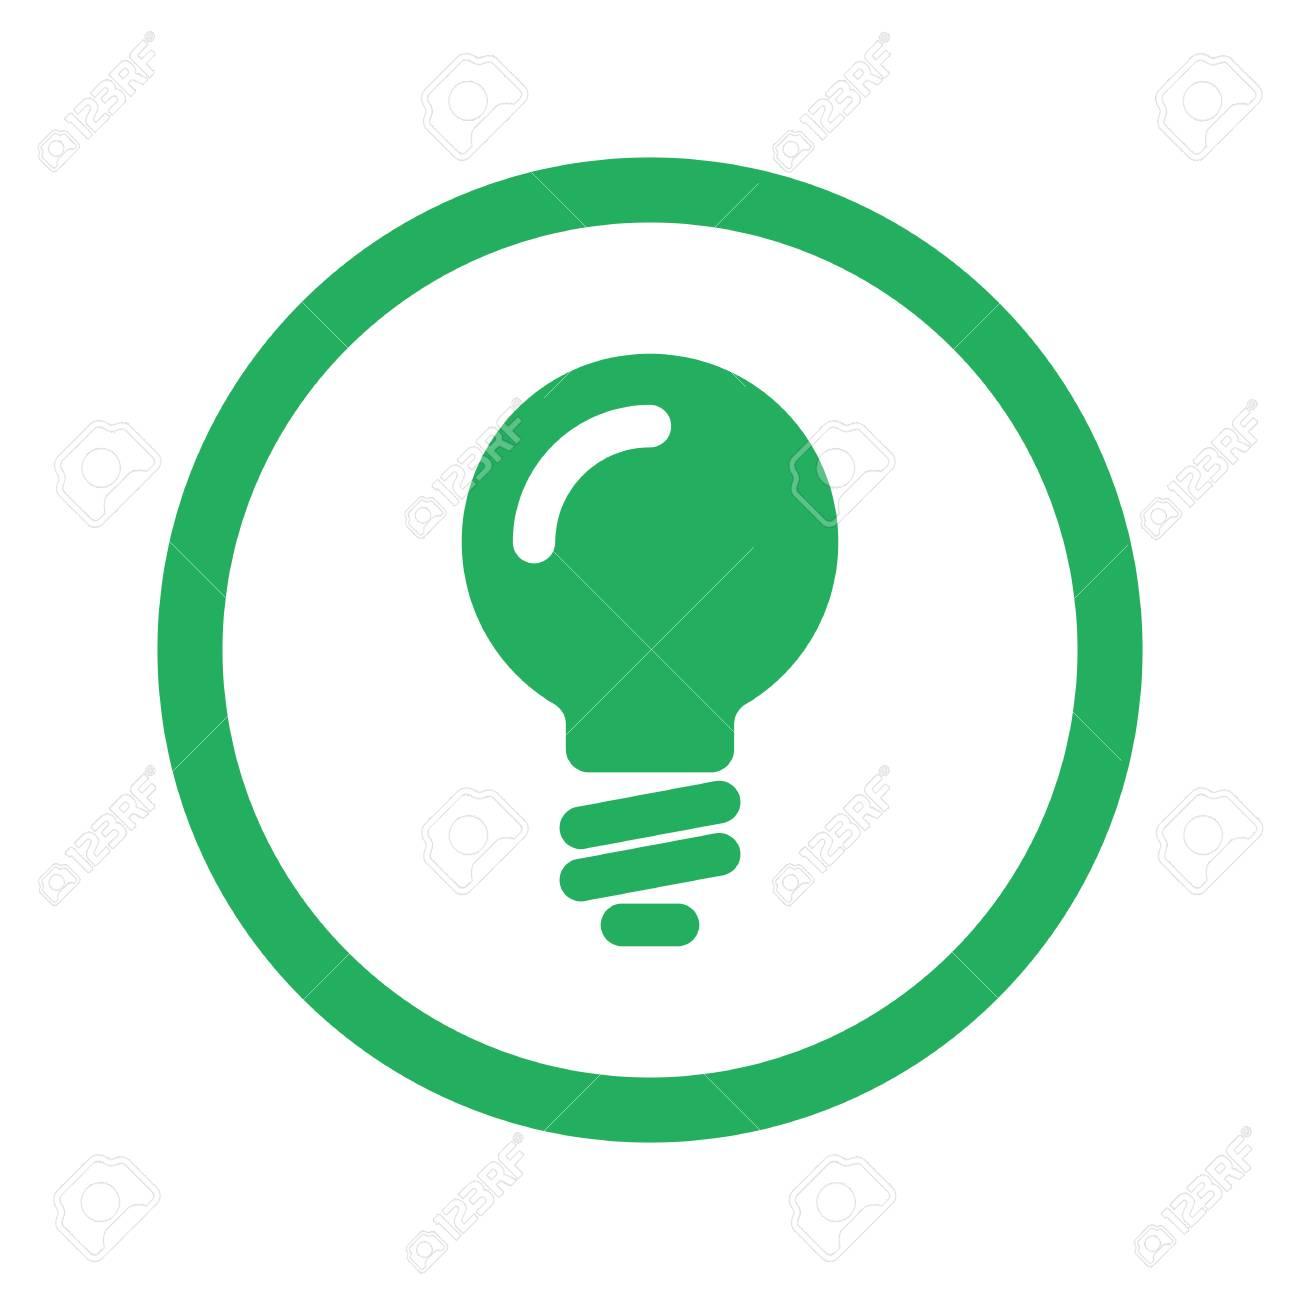 Flat Green Light Bulb Icon And Green Circle Royalty Free Cliparts